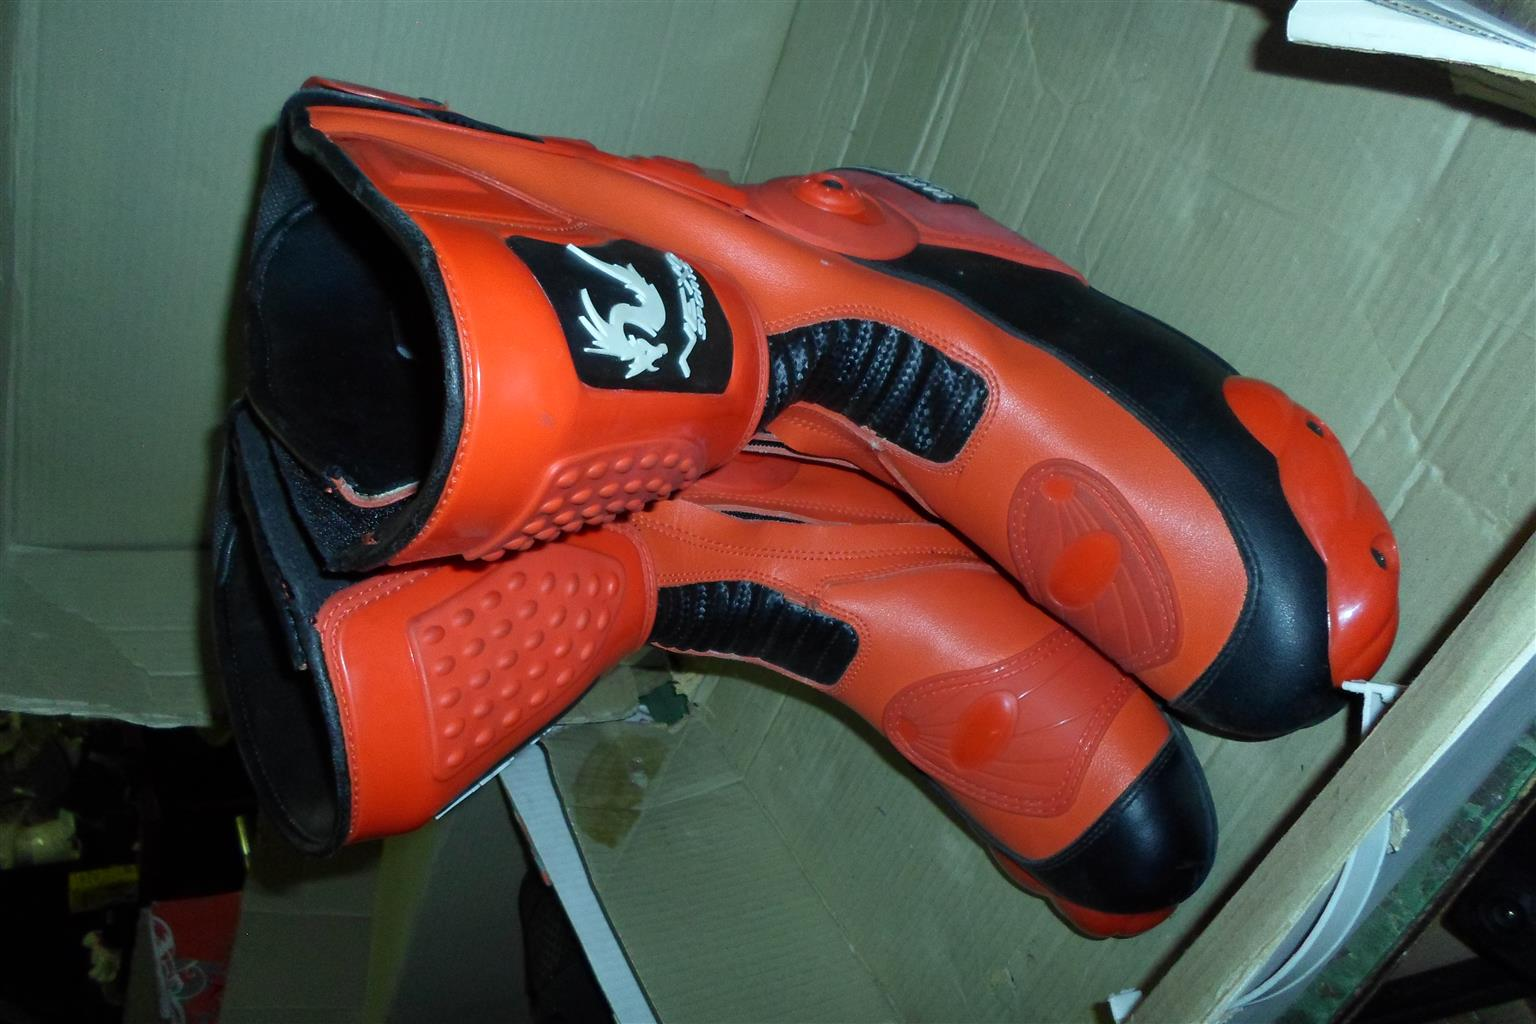 Size 45/11 Nexo Sports Motorcycle Boots